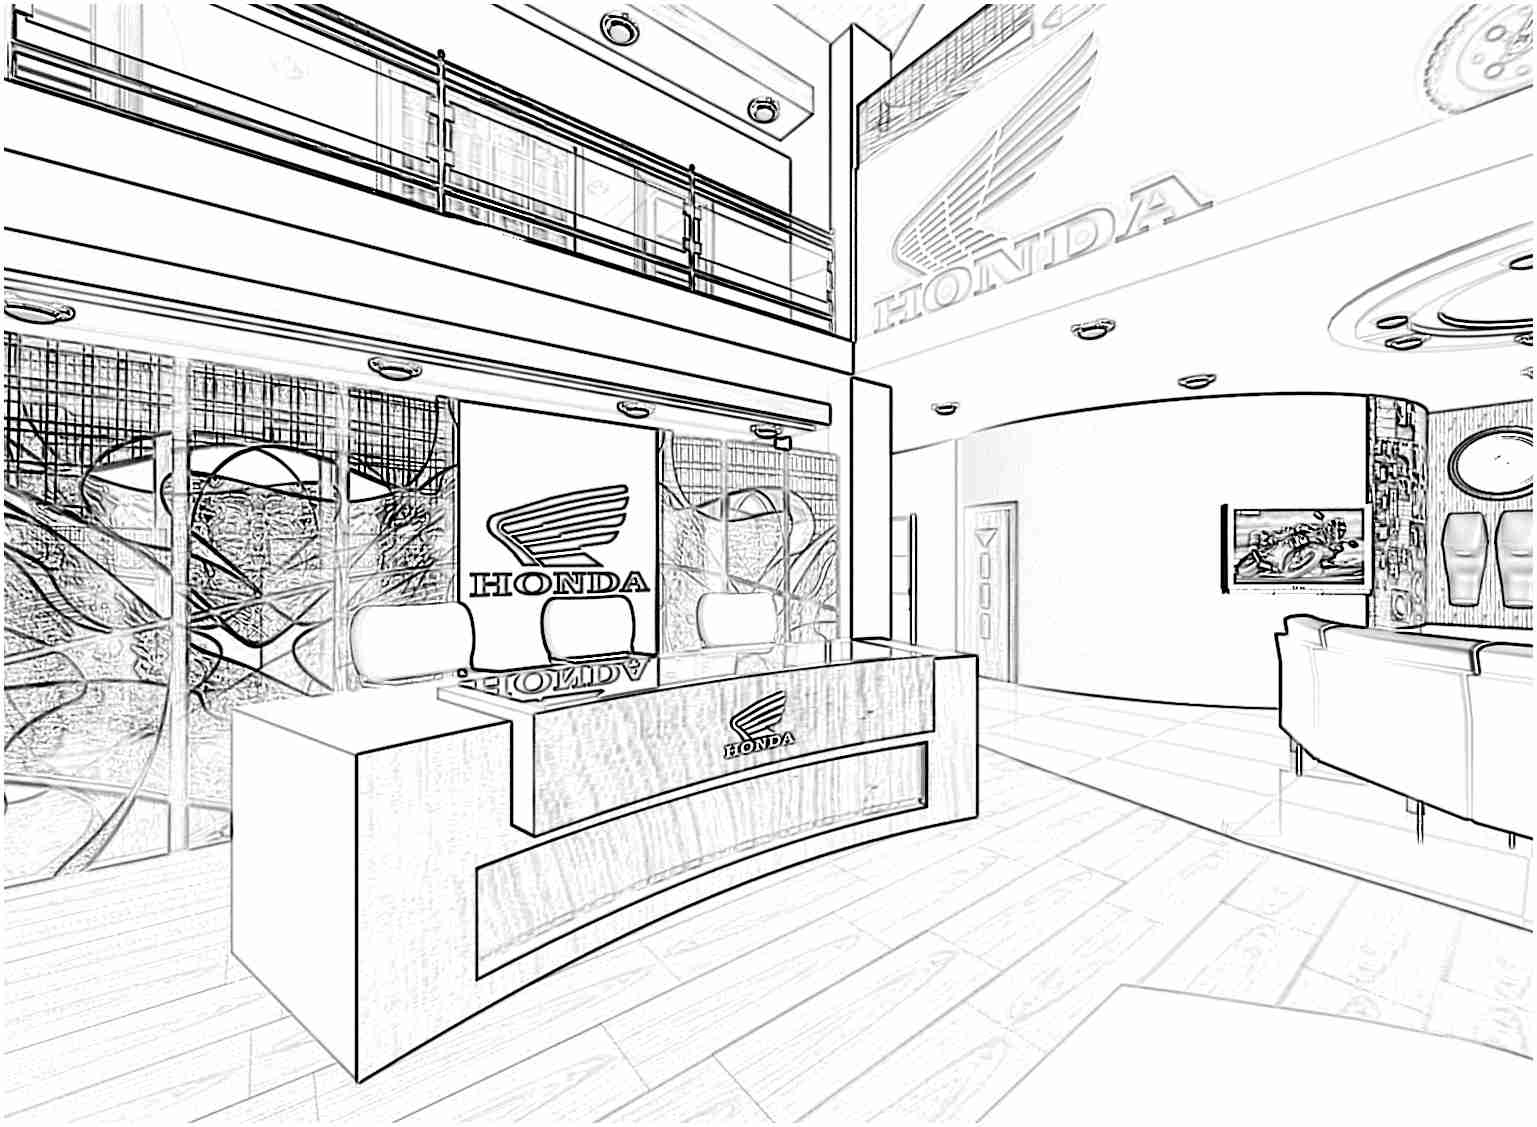 1537x1127 Krita Interiors My Thesis Sketch Work Of Bike Showroom